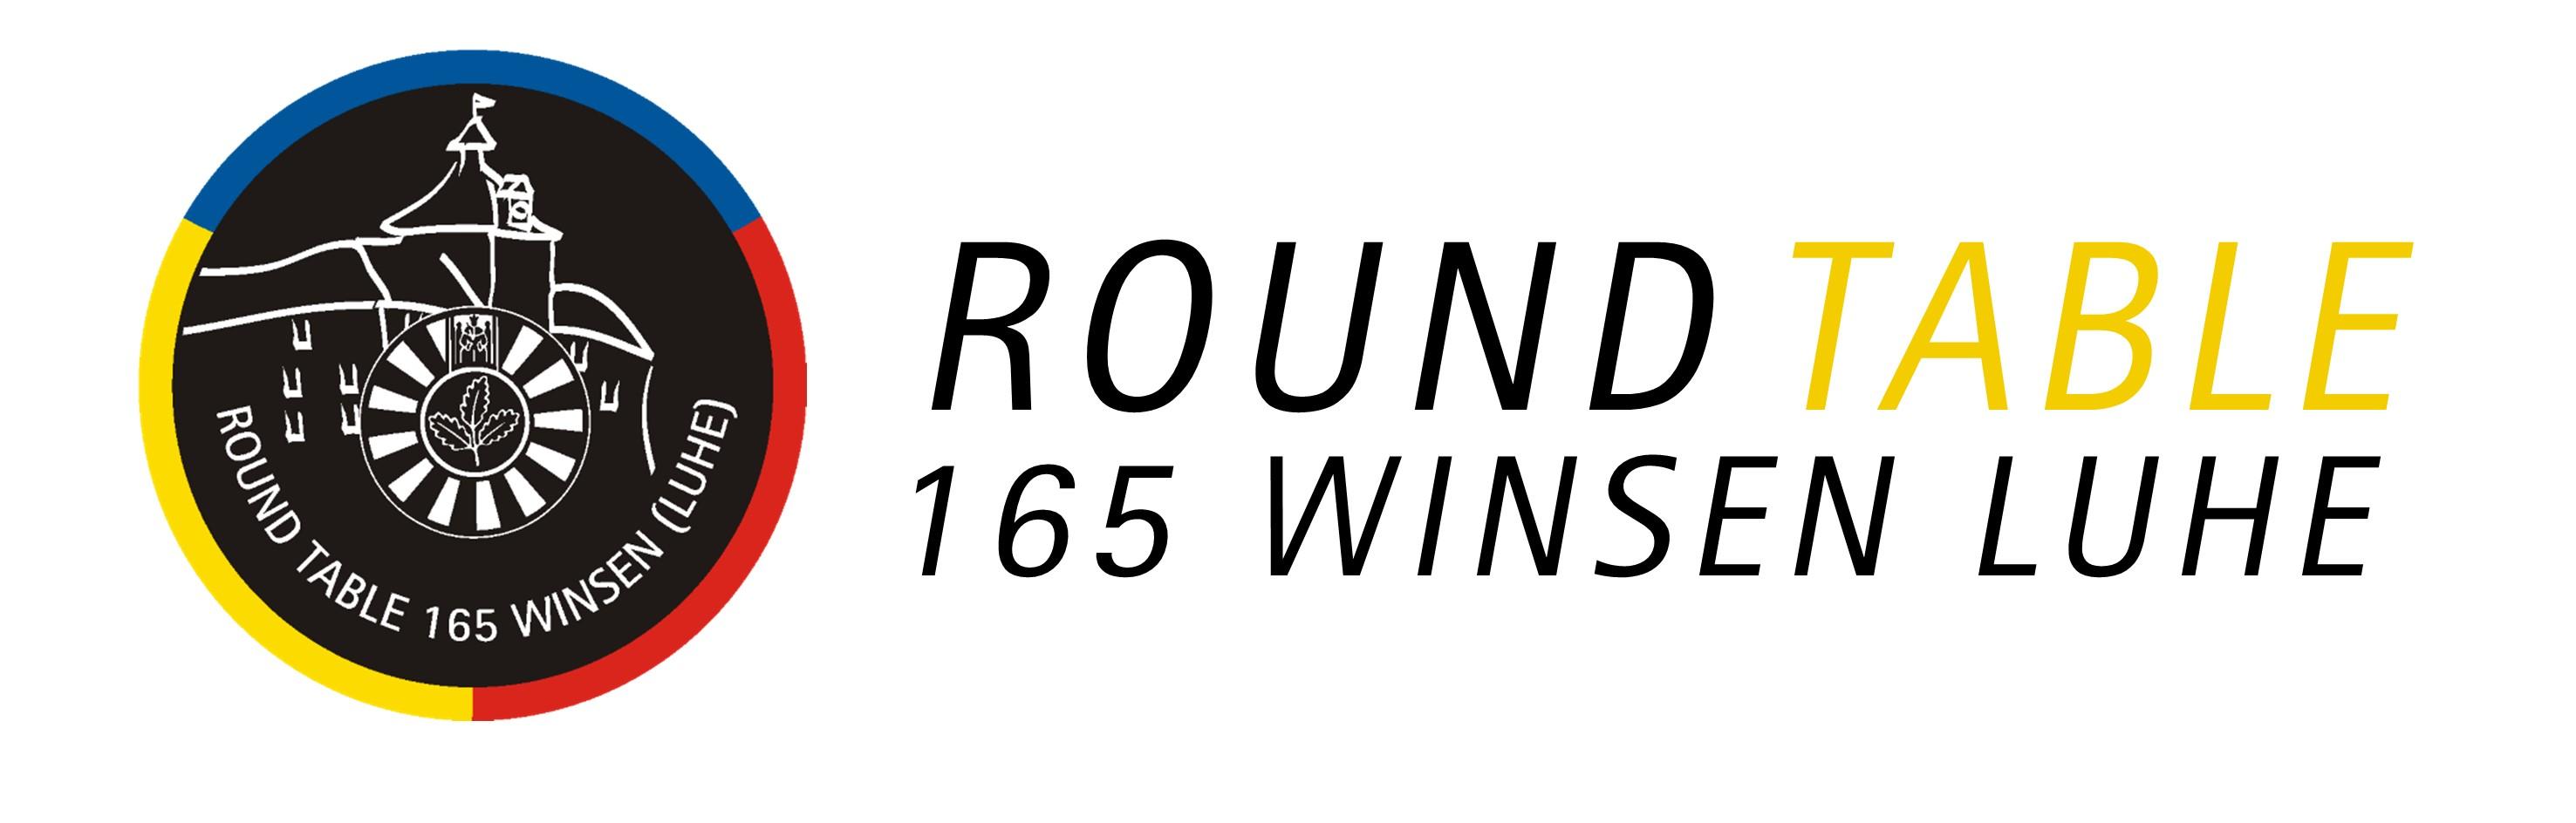 RT 165 WINSEN (LUHE)